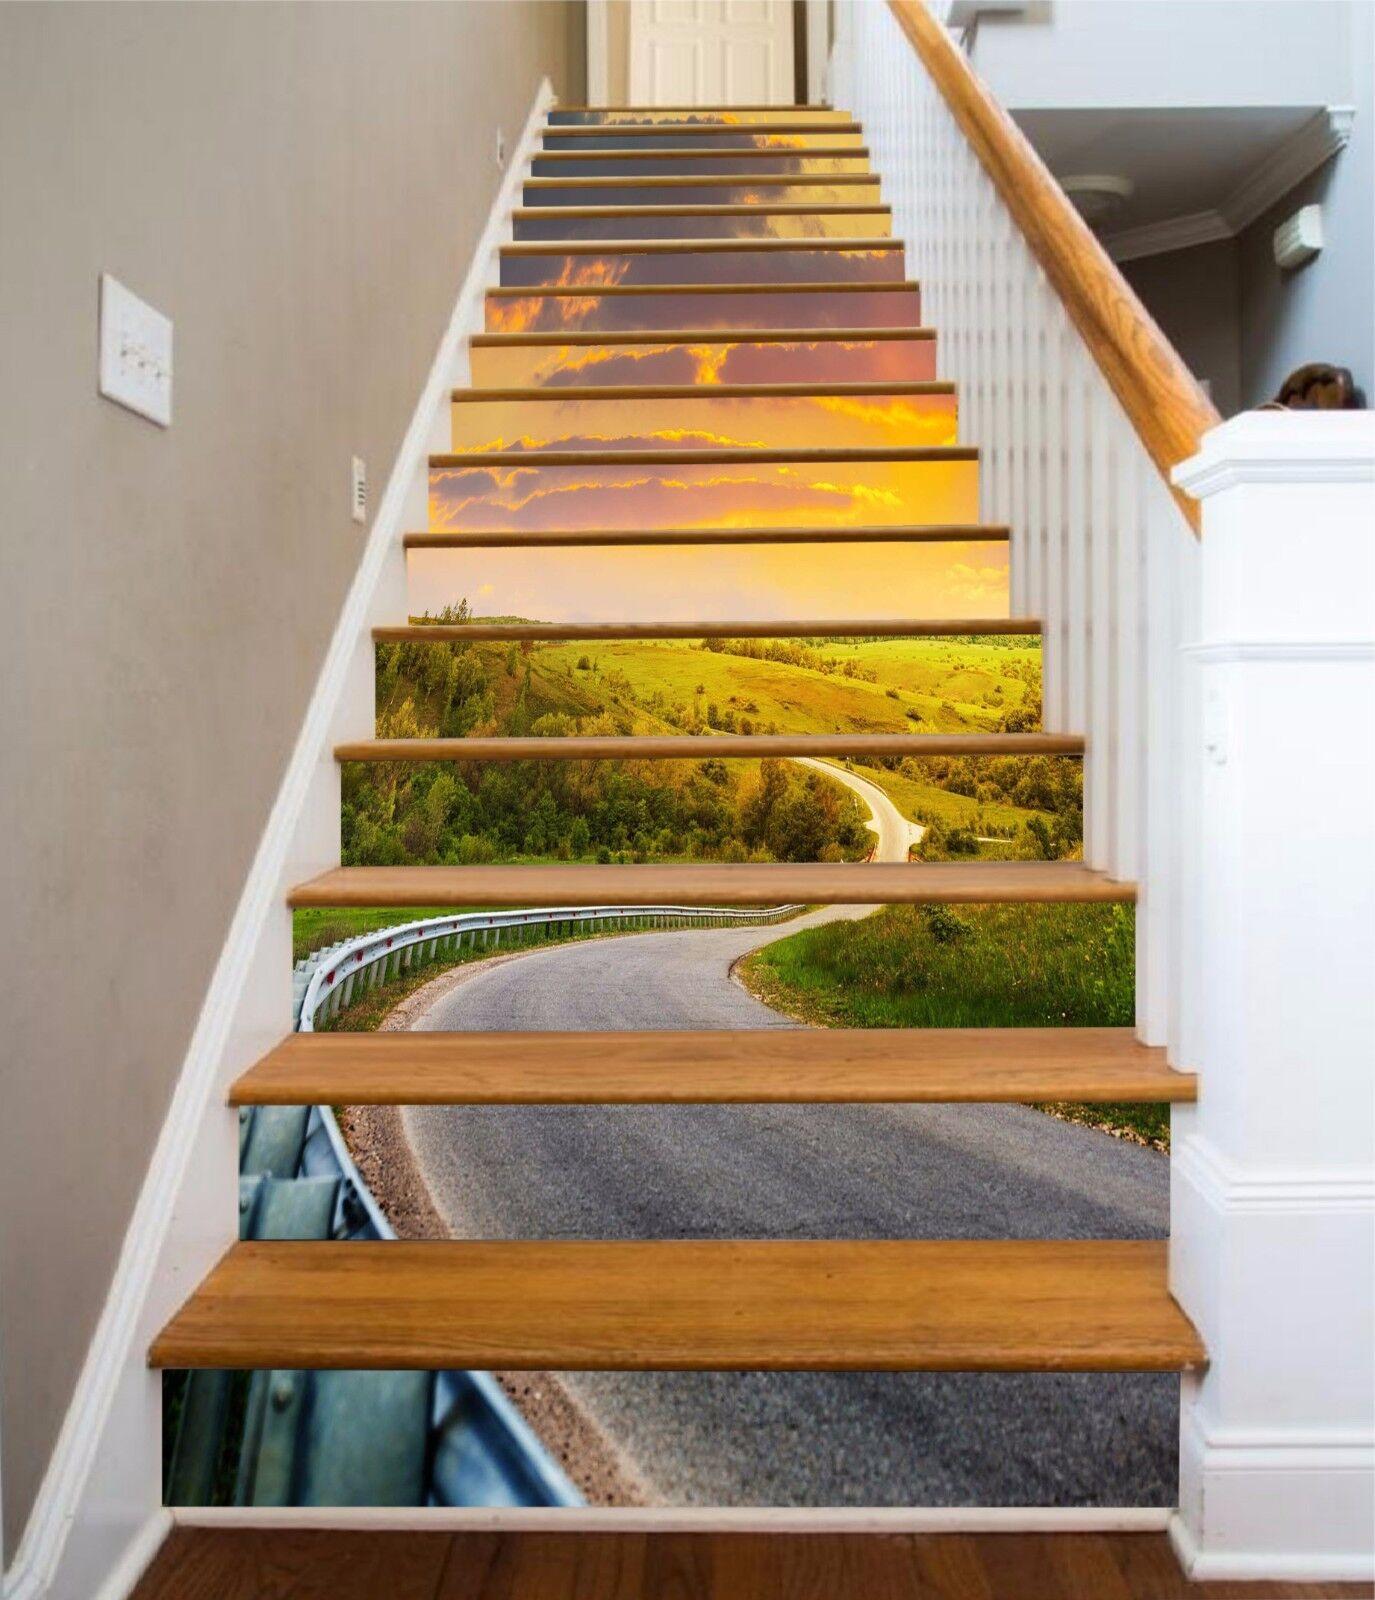 3D Sky Highway 52 Stair Risers Decoration Photo Mural Vinyl Decal WandPapier UK